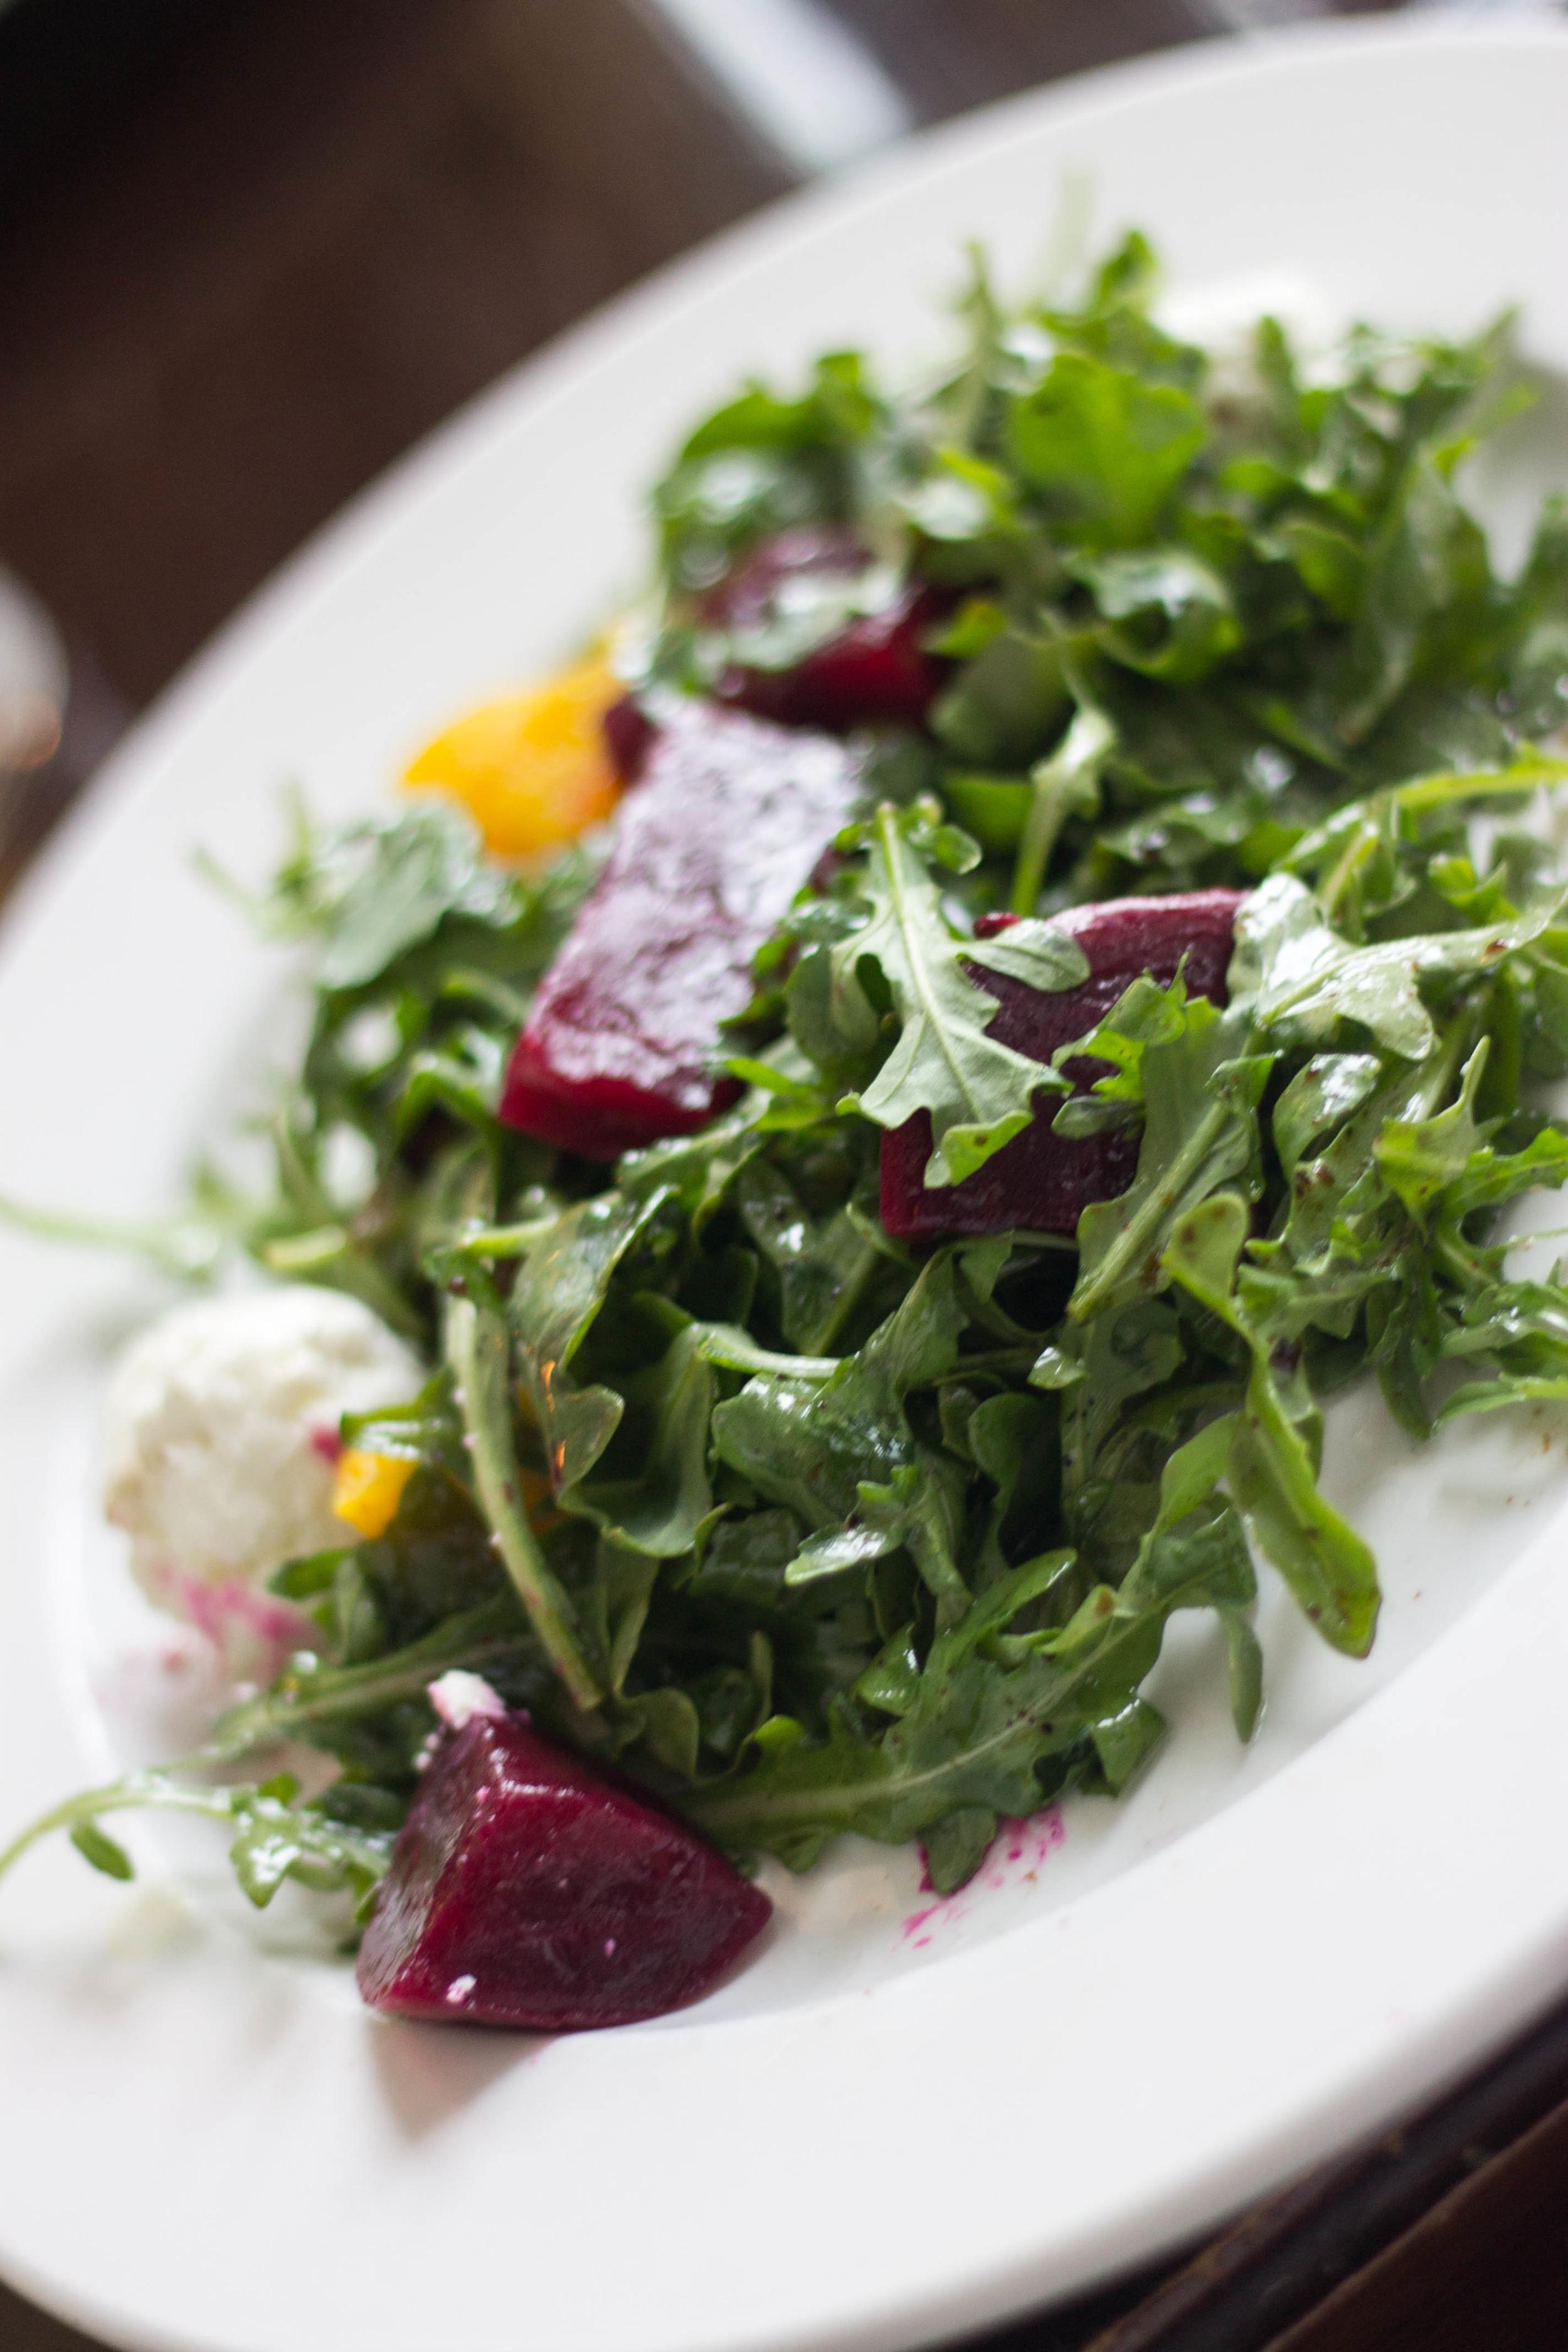 Roasted Beets Salad at Westport Cafe and Bar